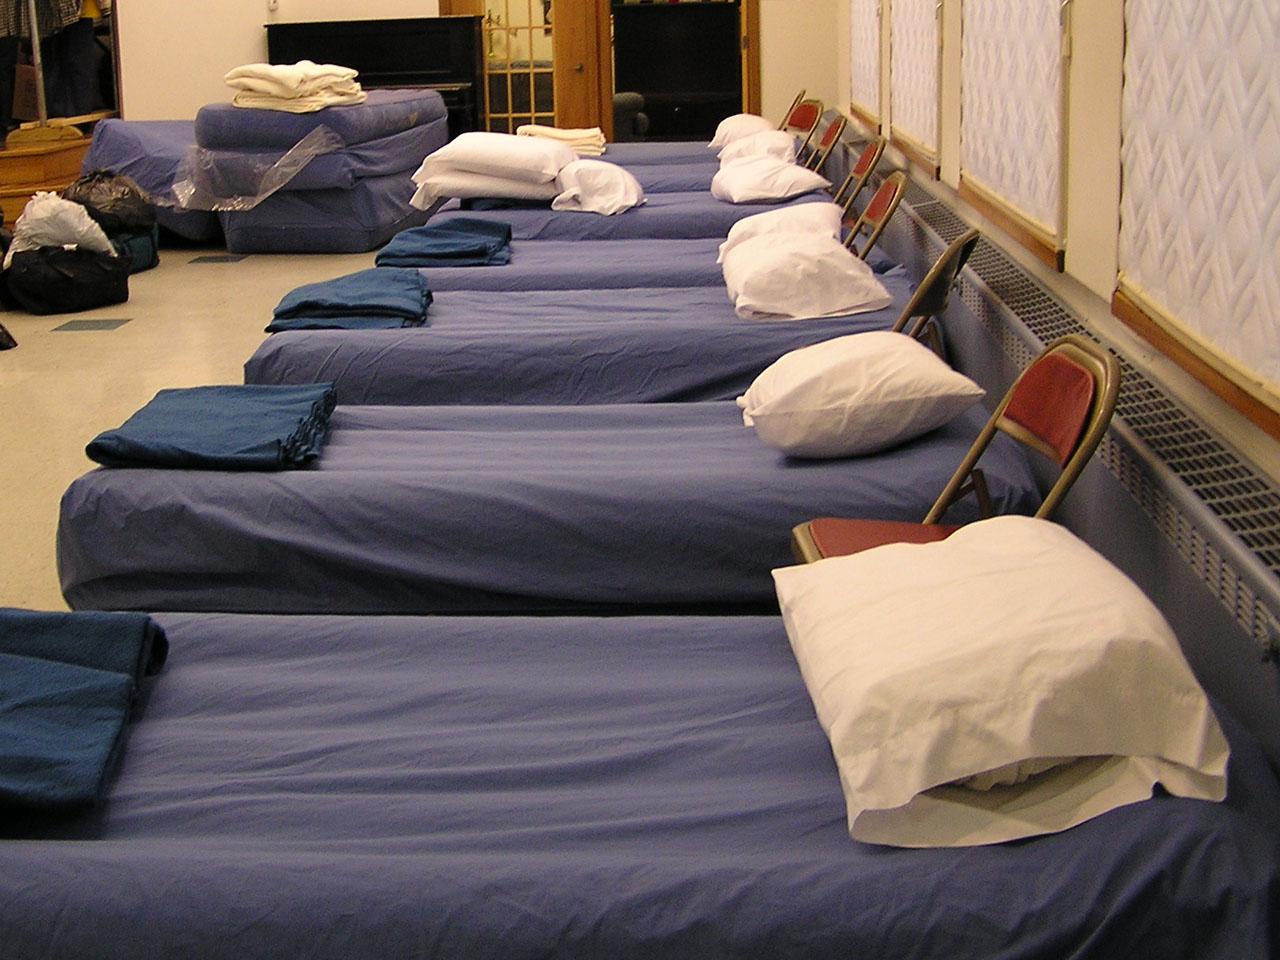 Supervisor solis motion expands homeless winter shelter for Homeless shelter in los angeles